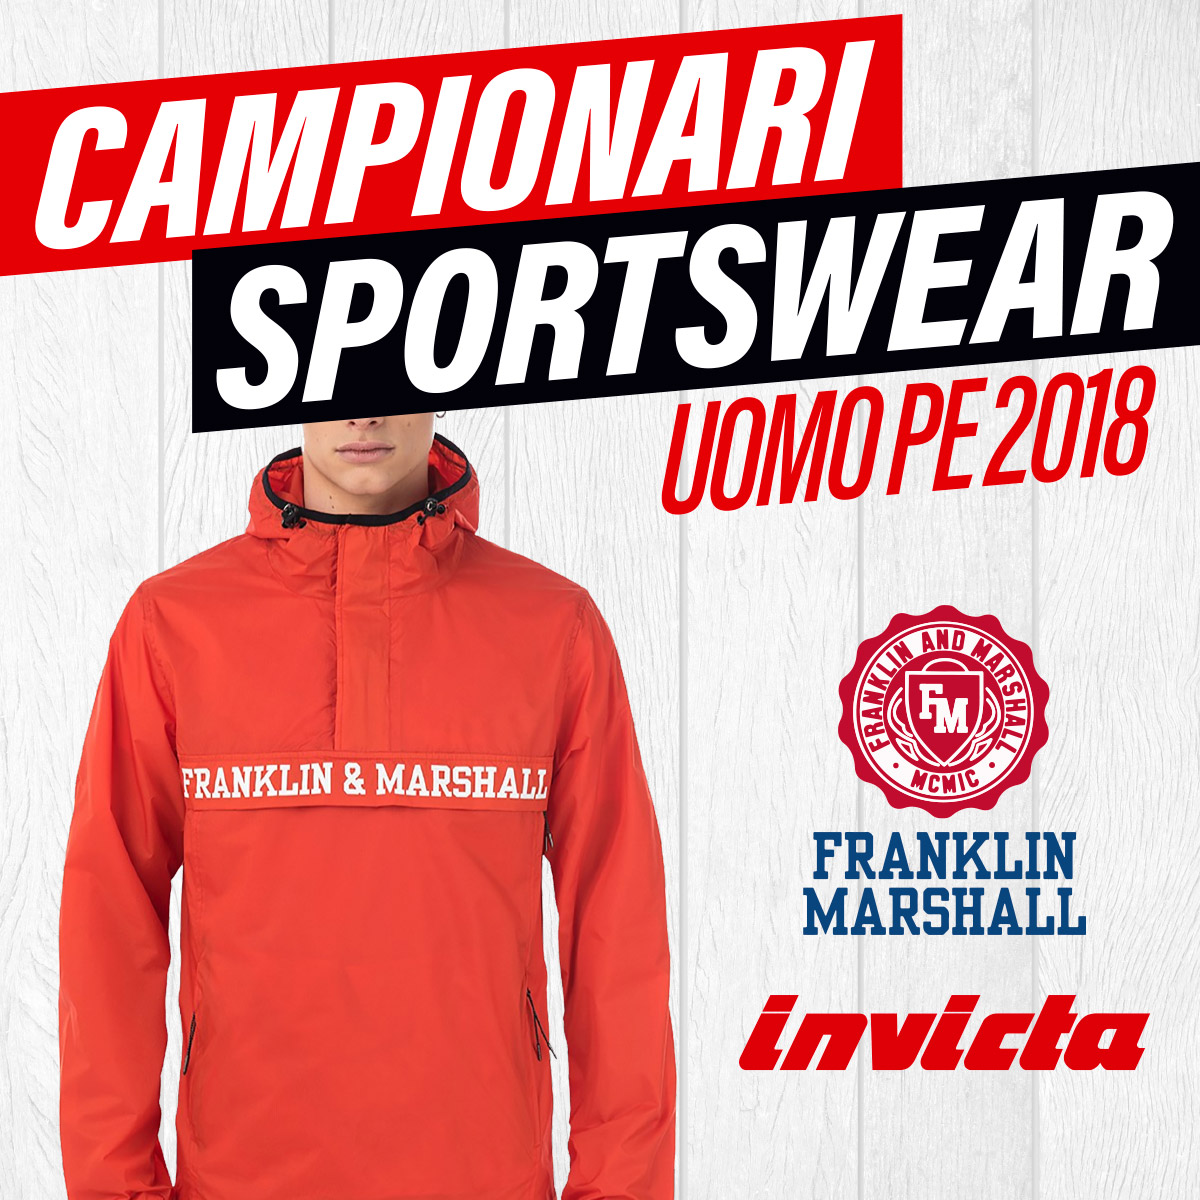 campionari sportwear primavera estate 2018 uomo